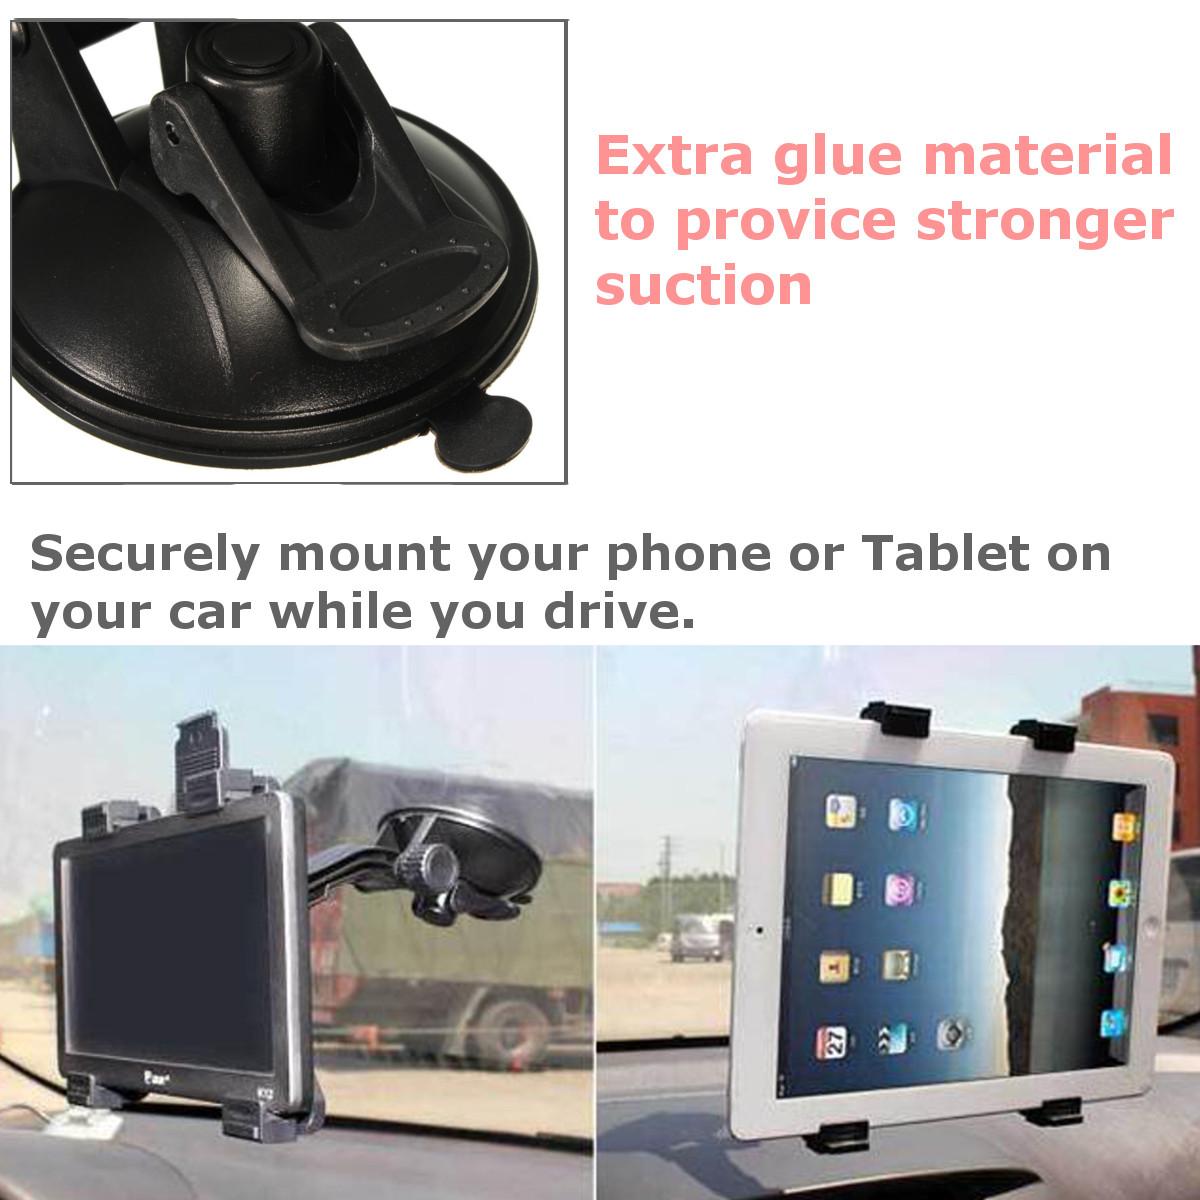 Cd Drive Car Tablet Mount